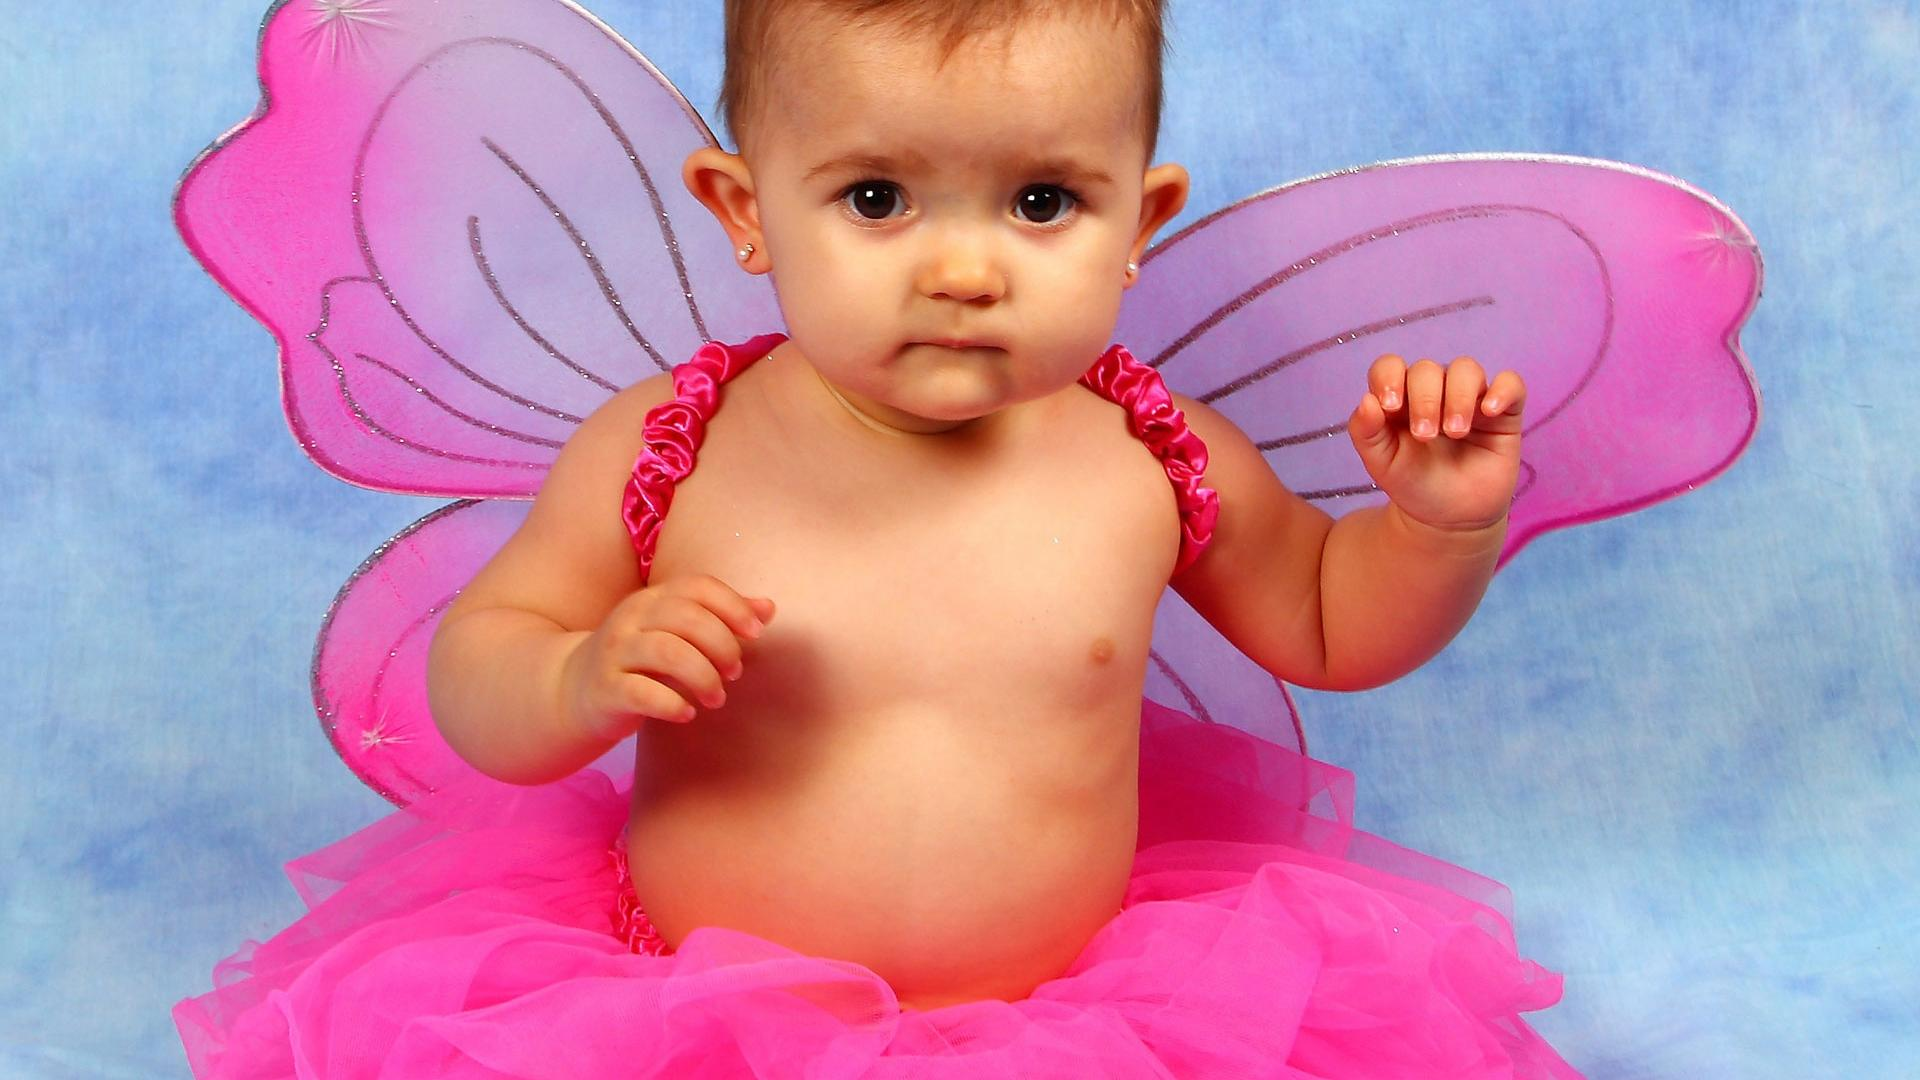 48 Baby Wallpaper Download On Wallpapersafari